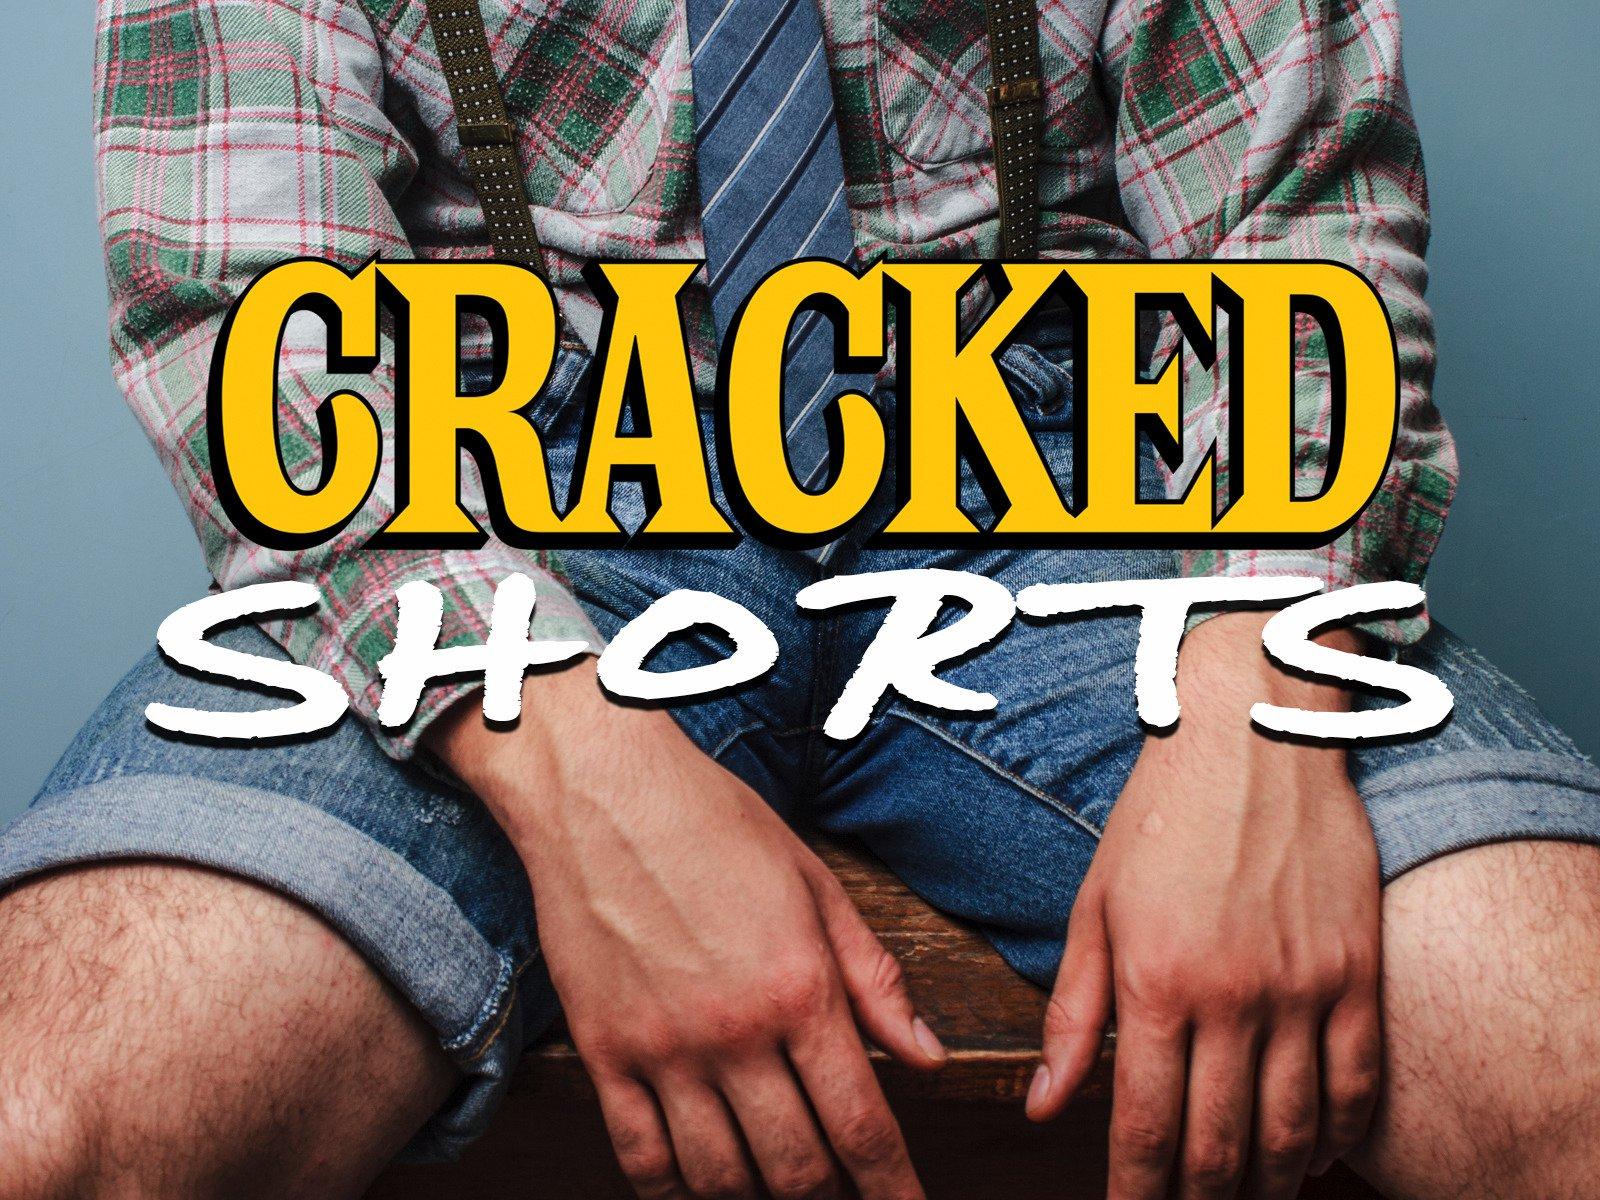 Cracked Shorts - Season 1